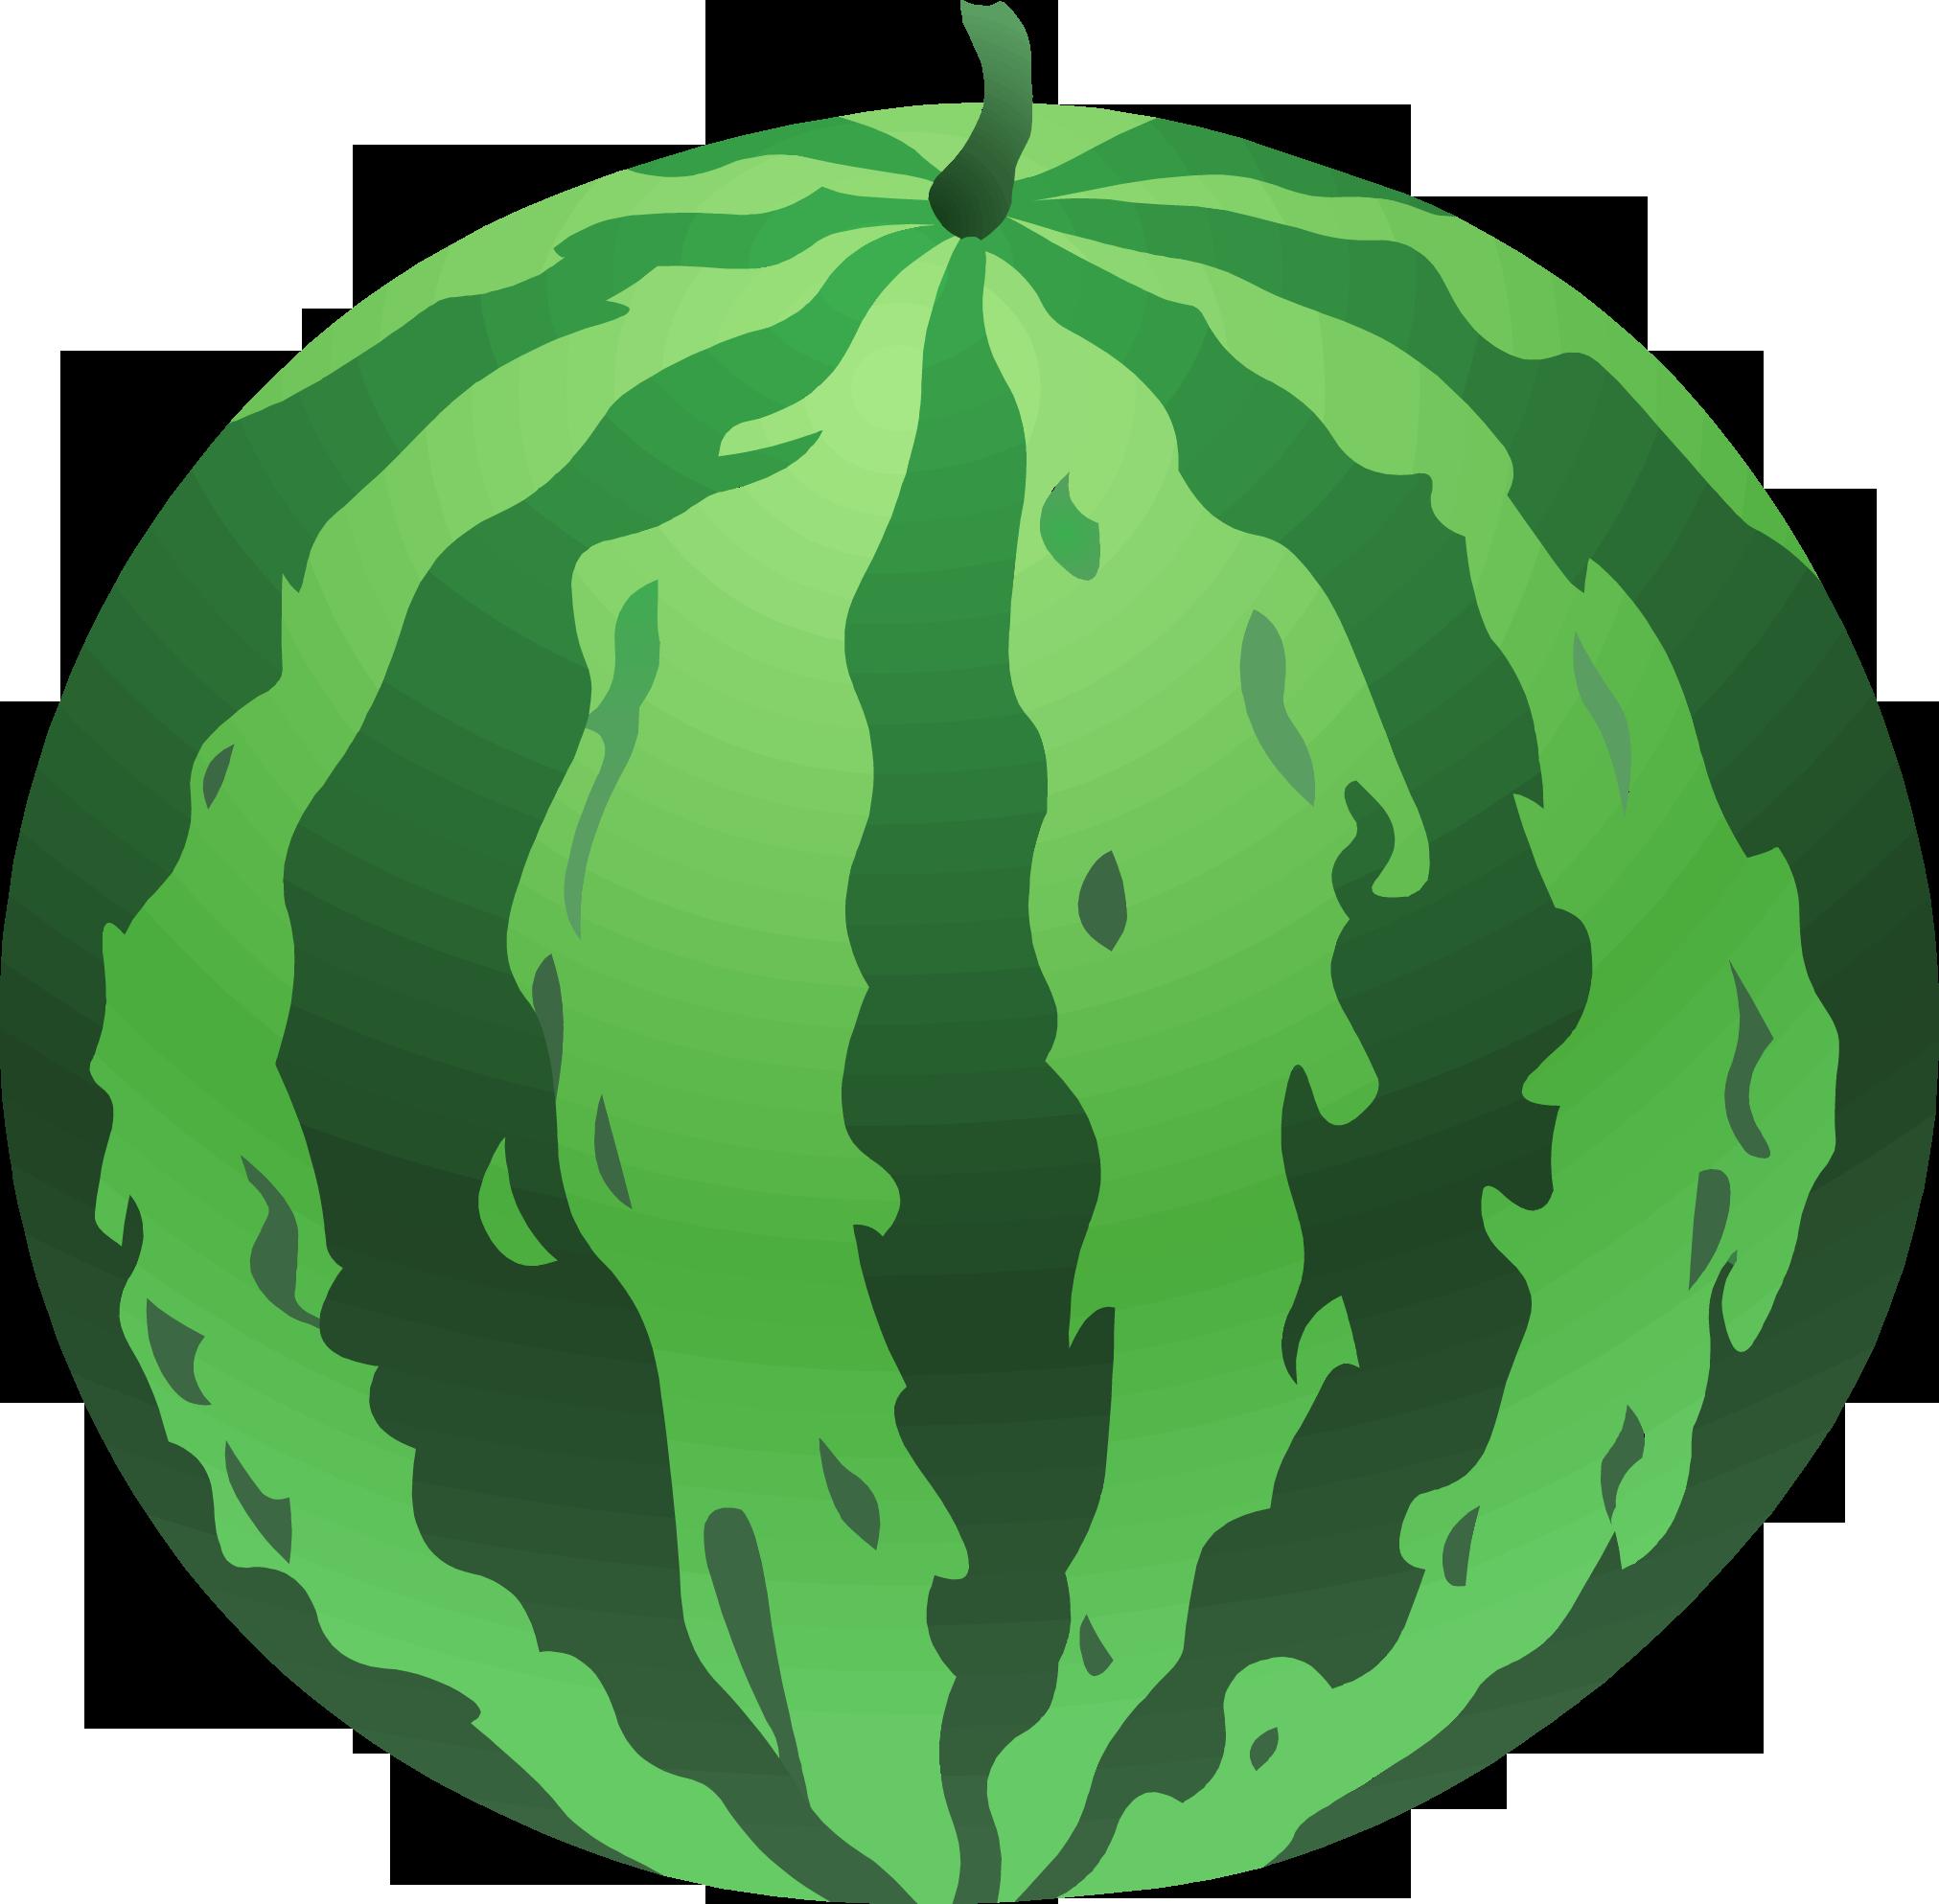 Watermelon clipart free clip art image 1